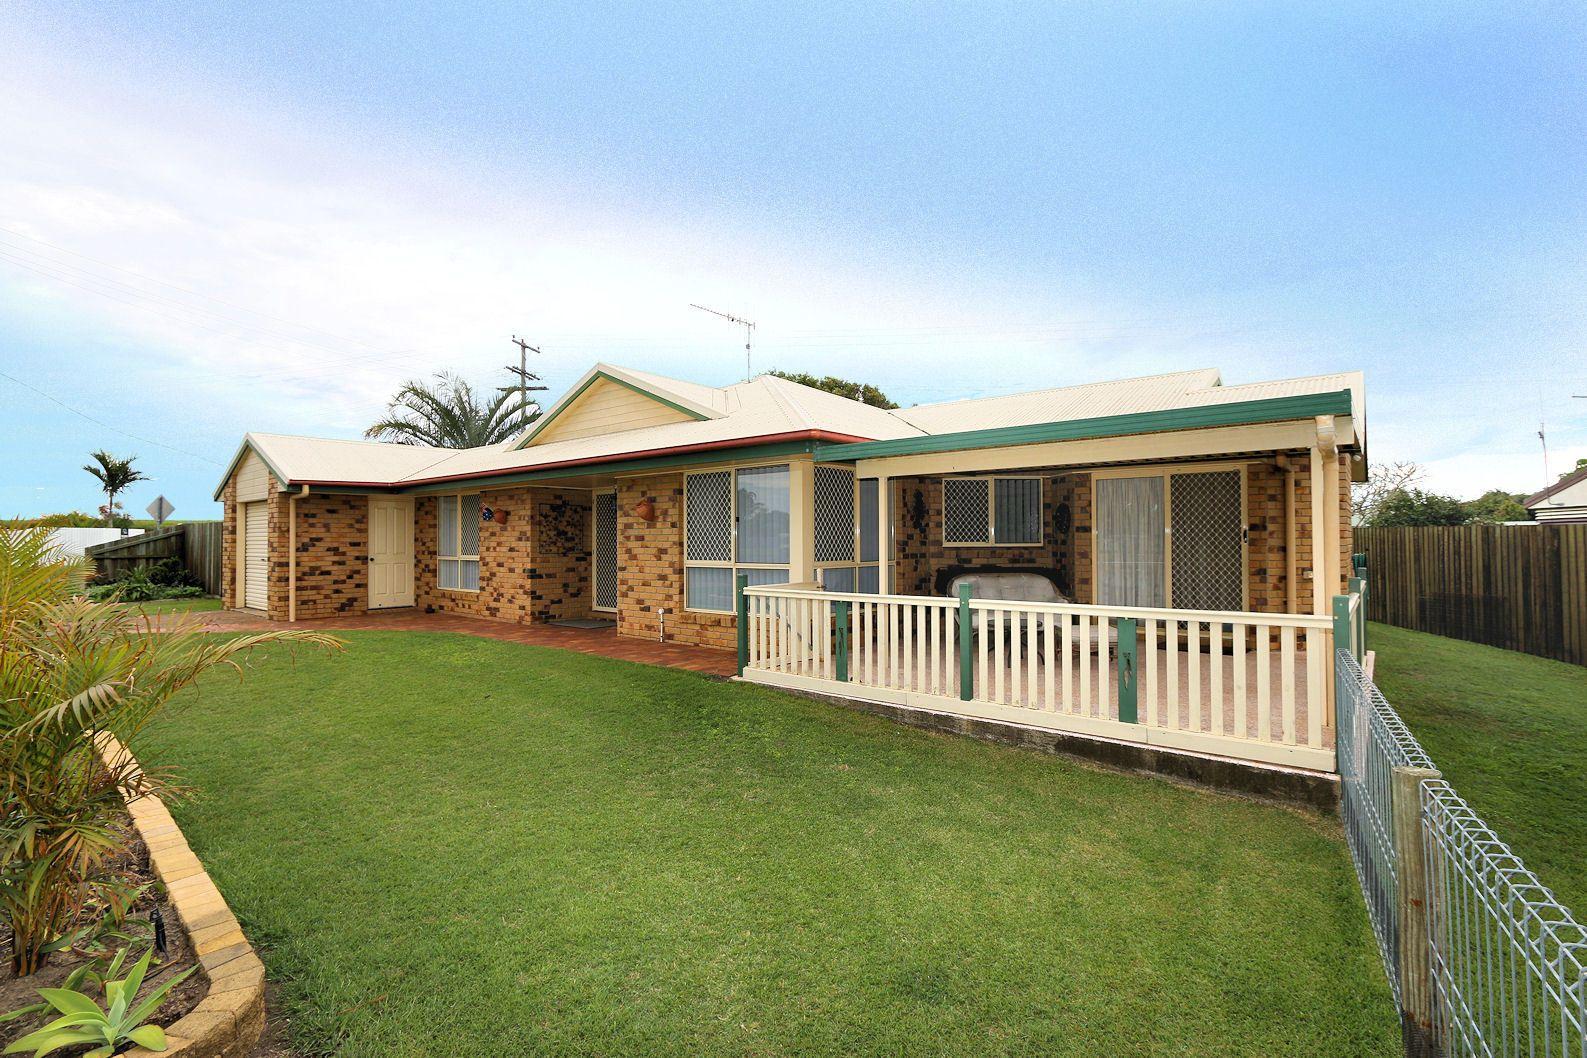 34 Innes Park Rd, Innes Park QLD 4670, Image 0